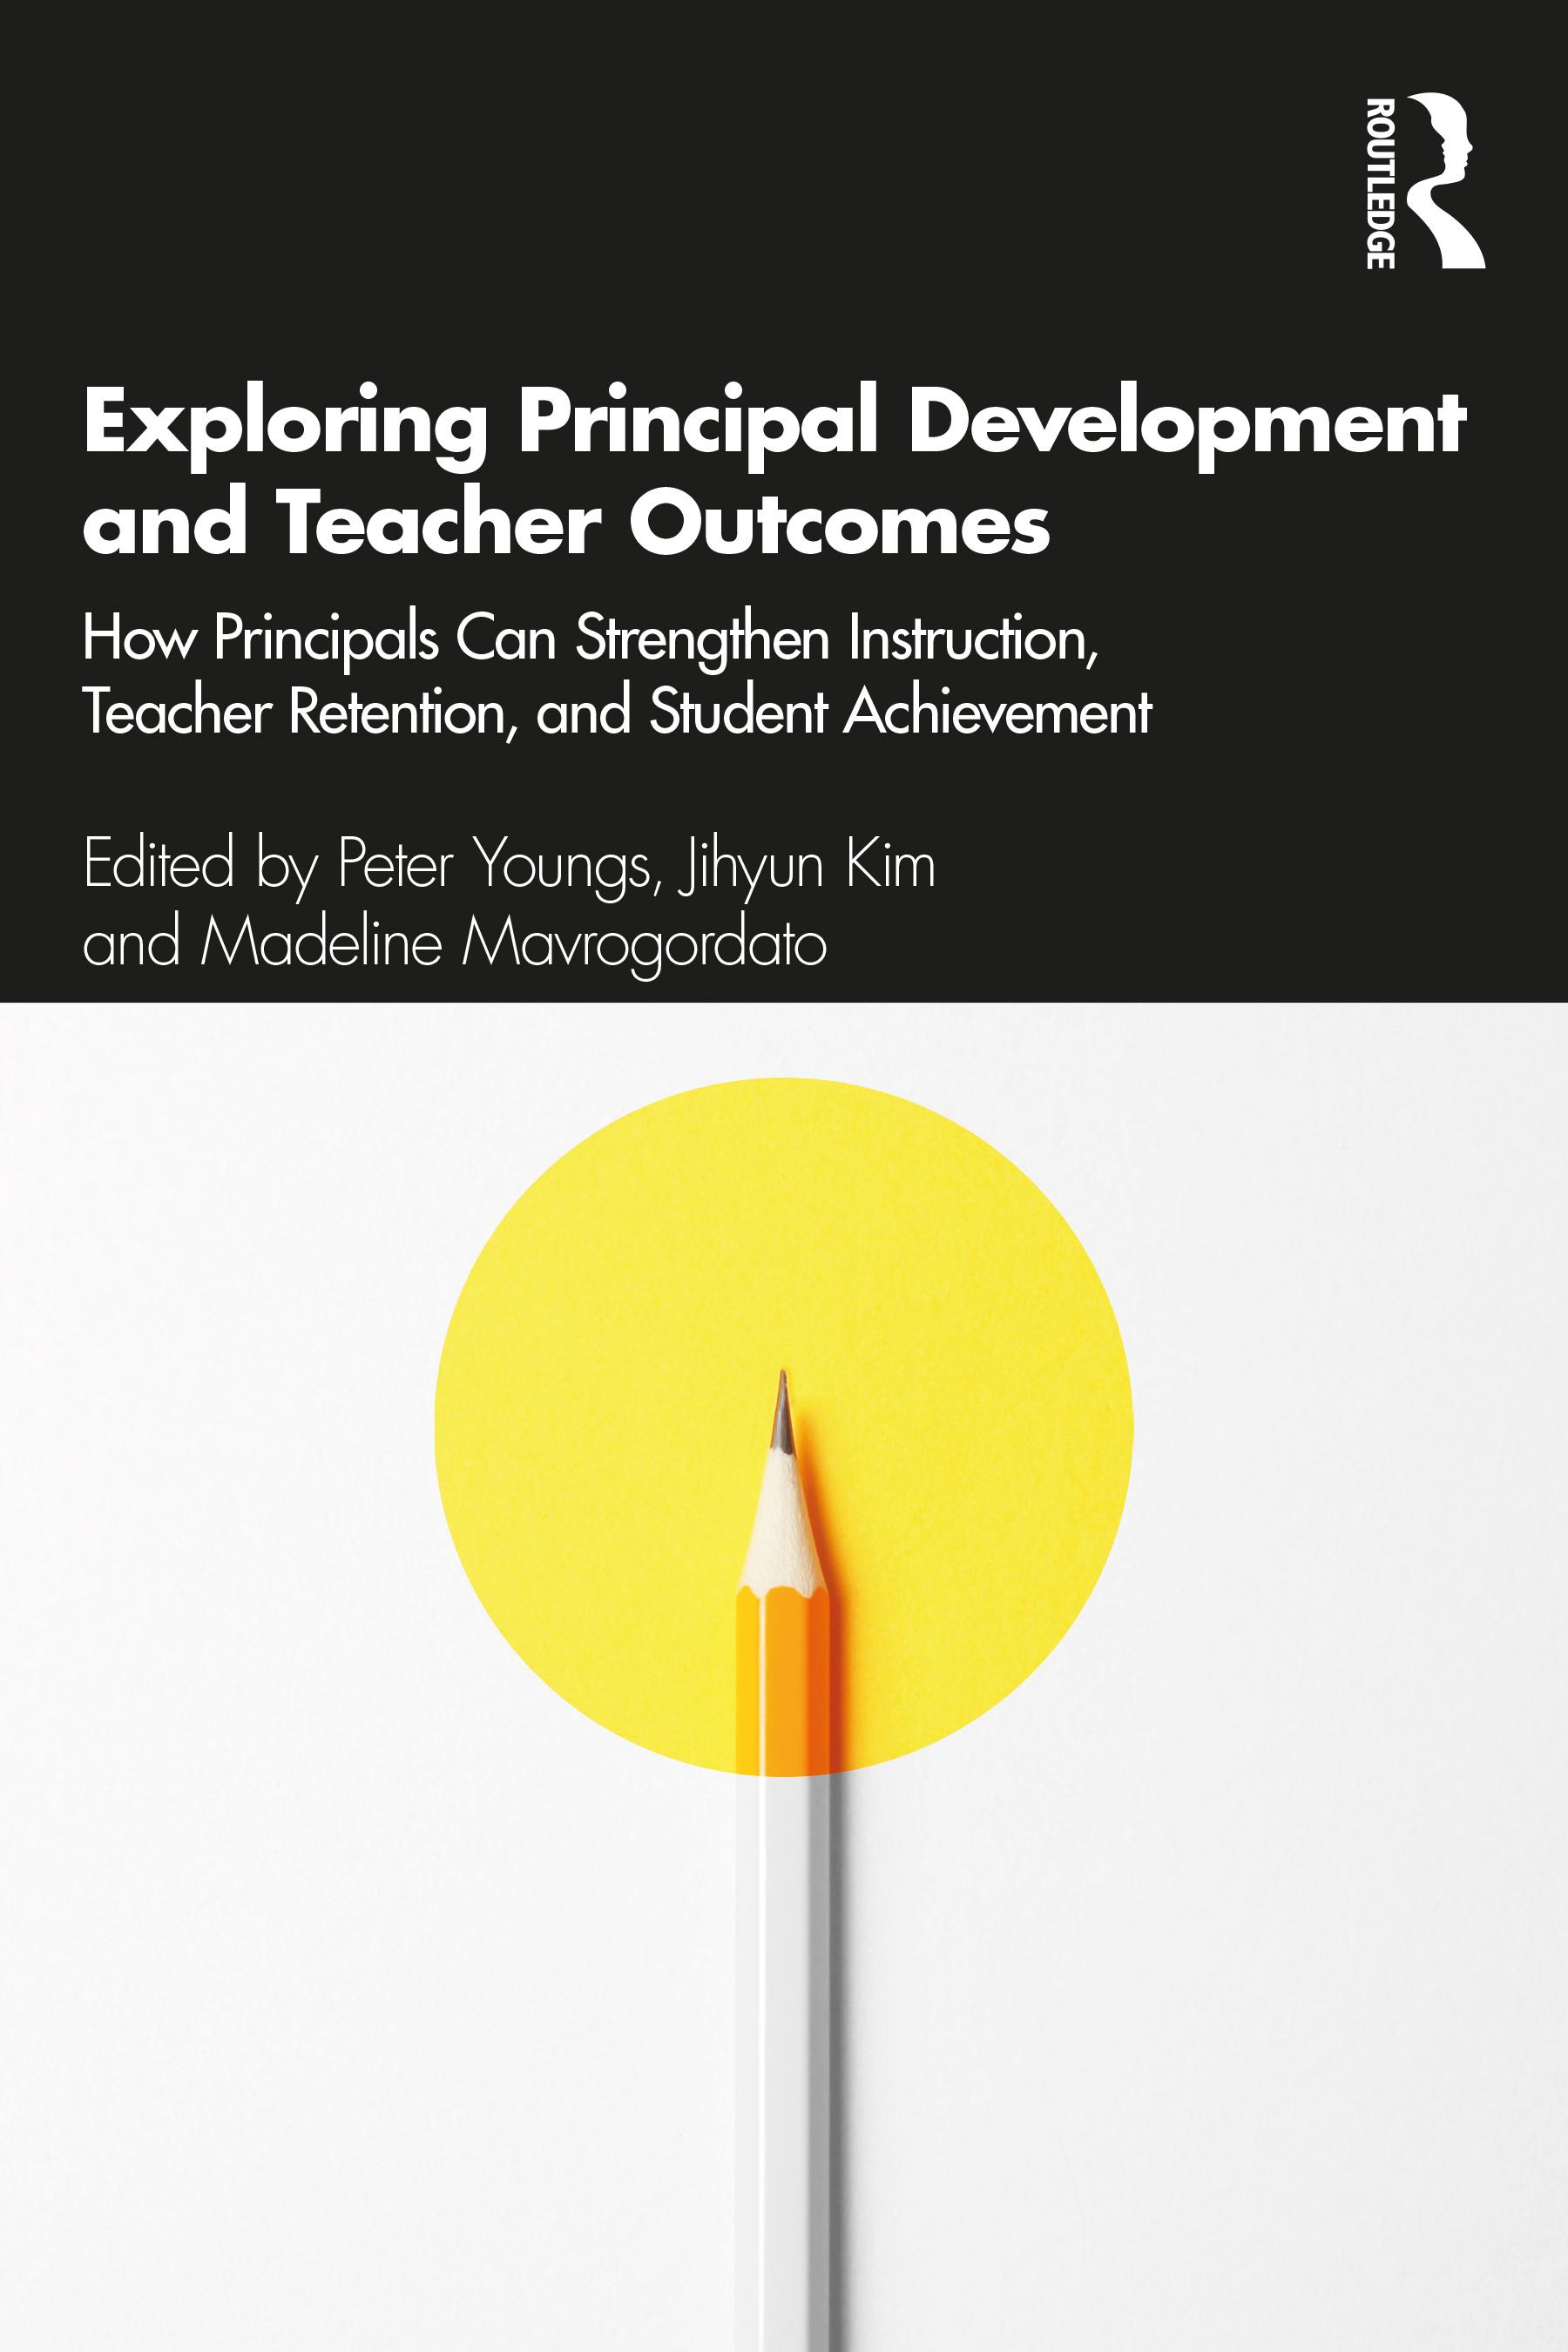 Principal Leadership Practices, Organizational Improvement, and Student Achievement